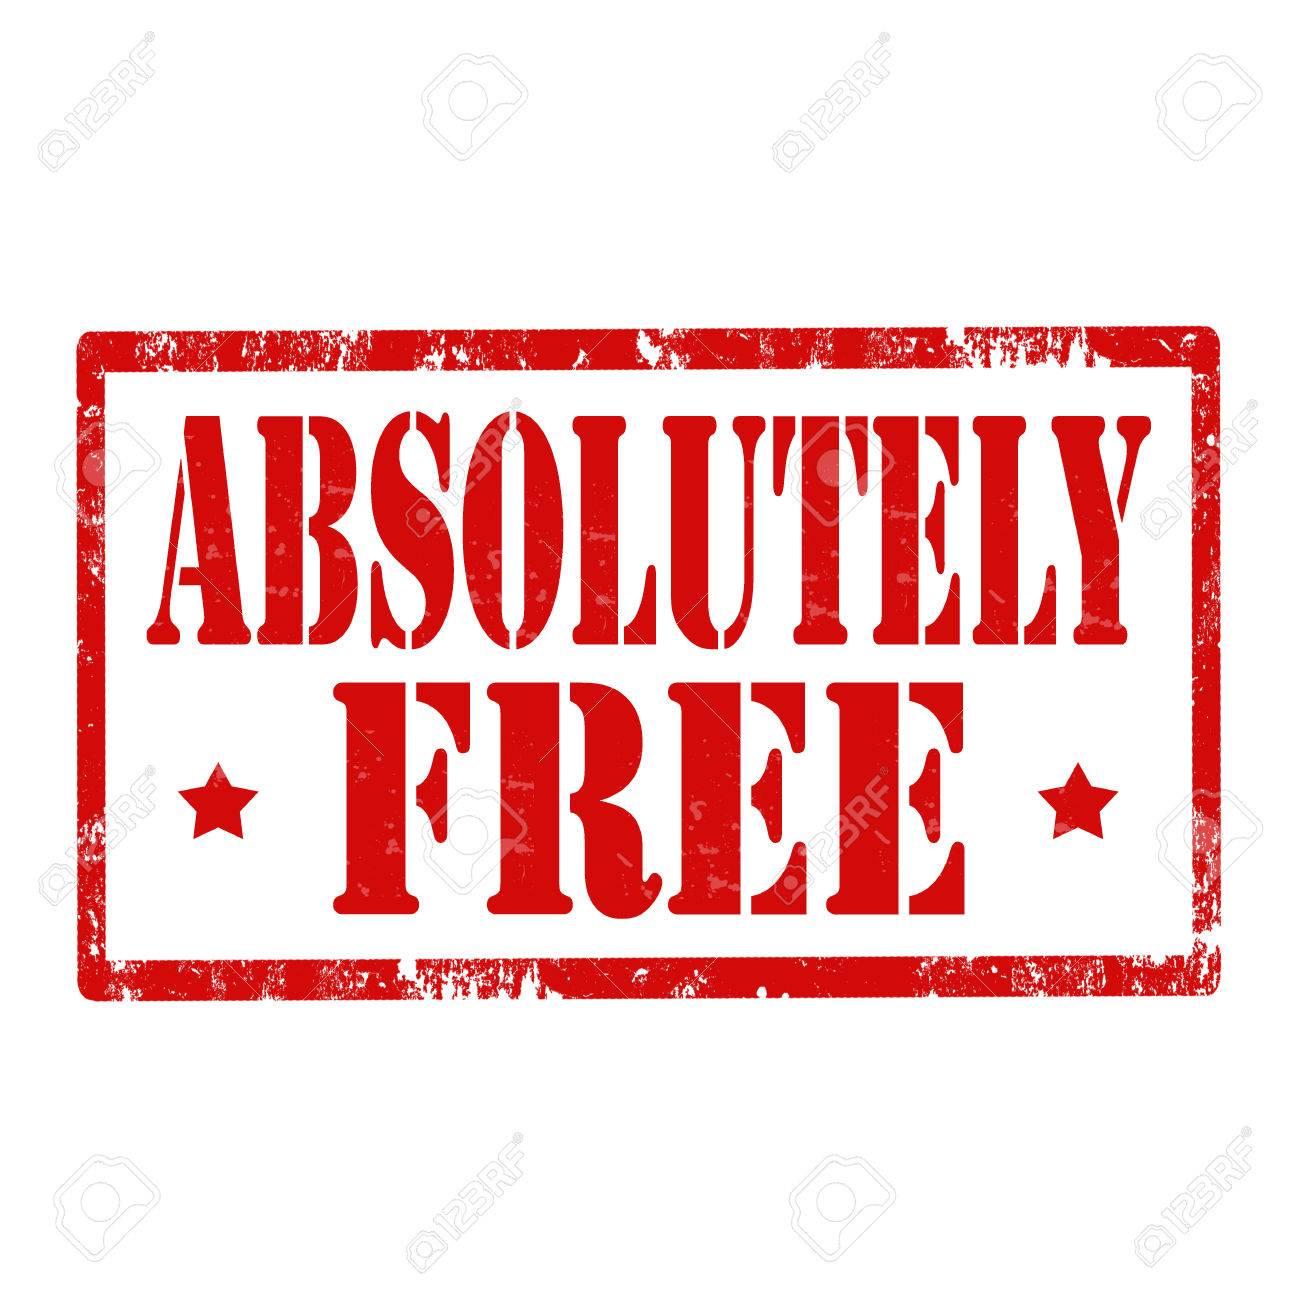 Absolutely free xxx pics 75